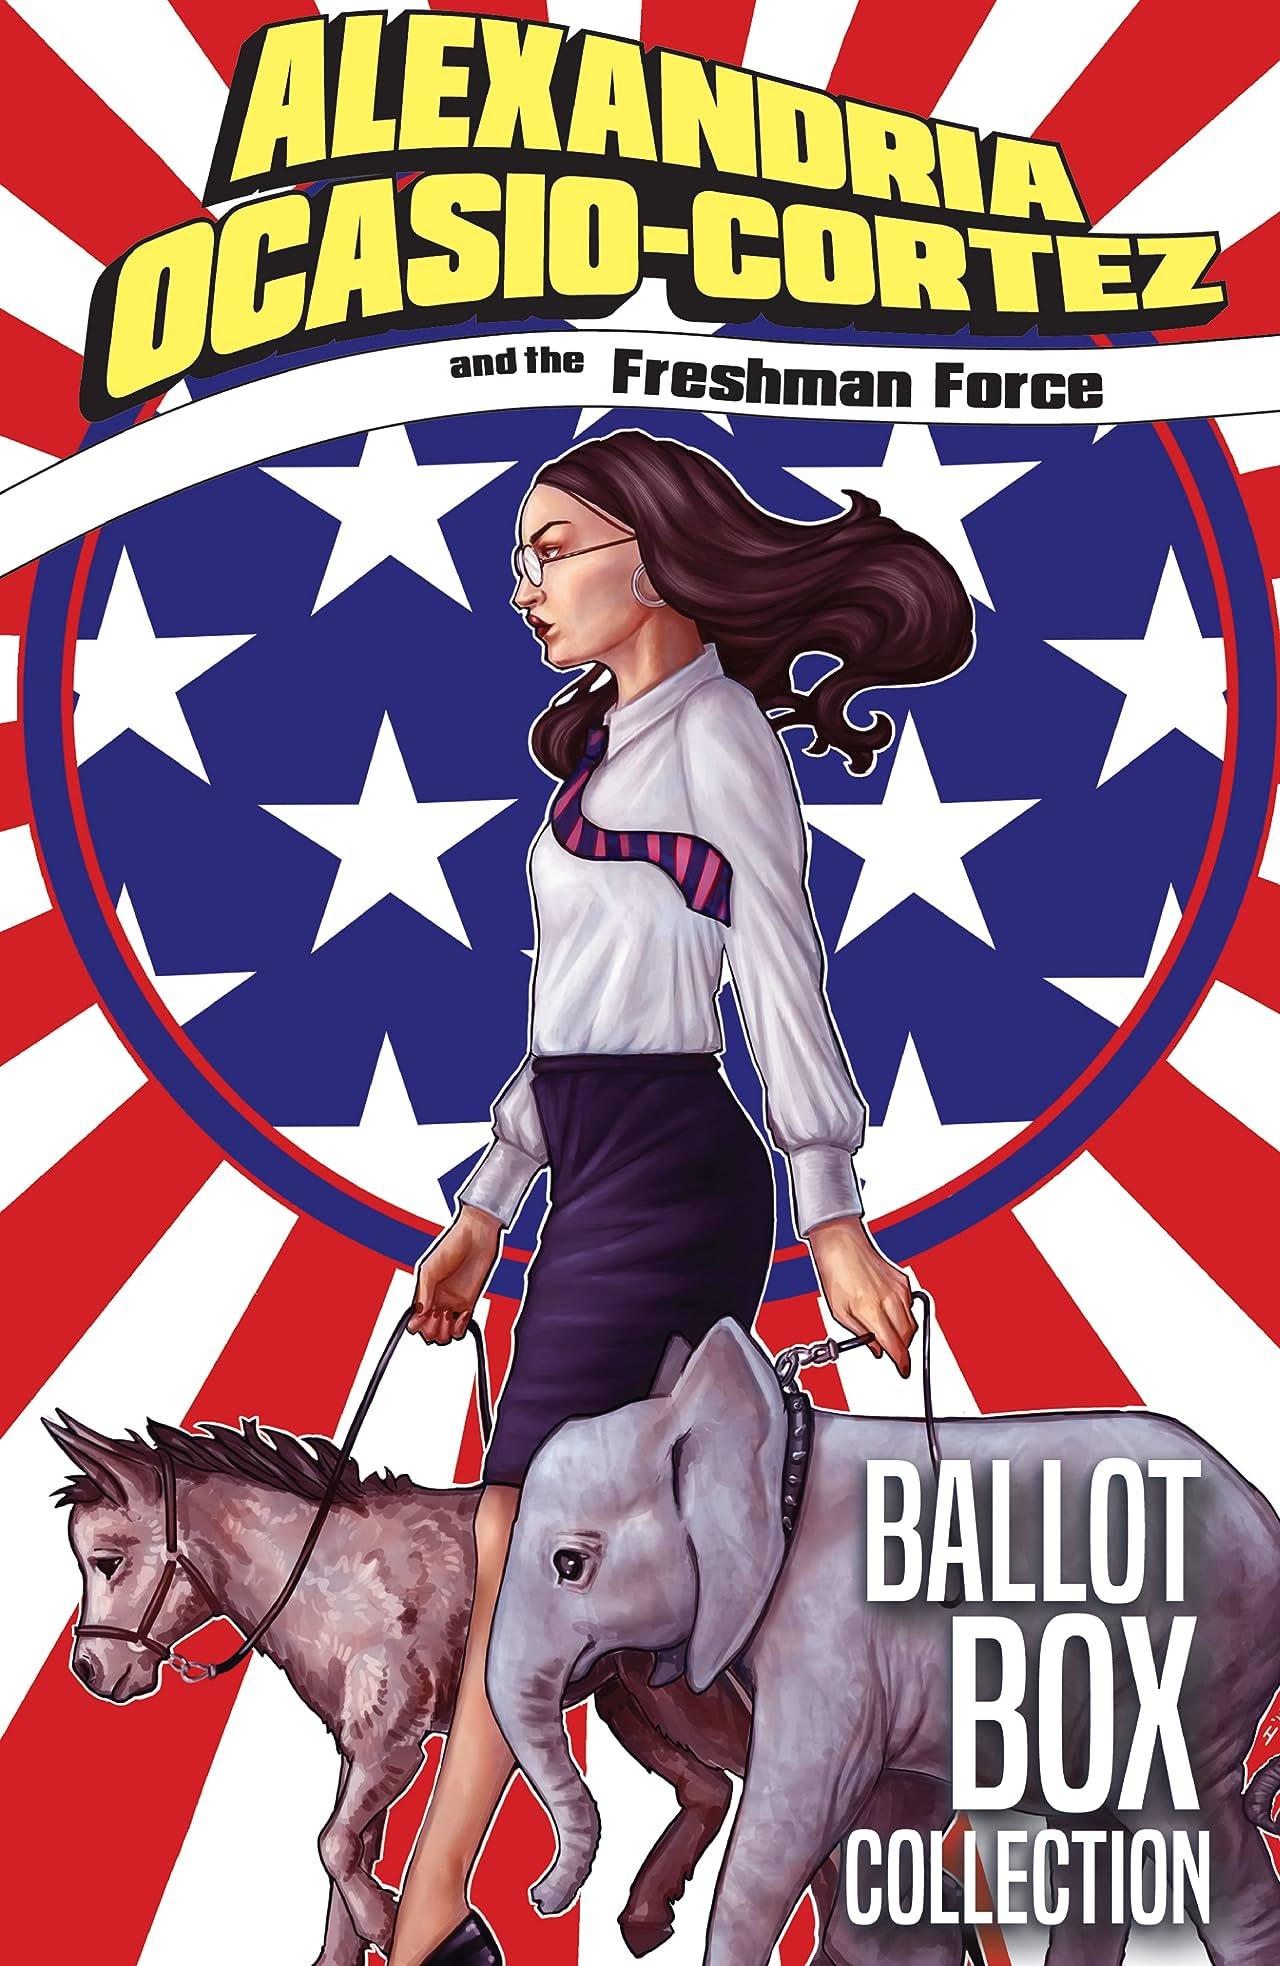 Alexandria Ocasio-Cortez and the Freshman Force: Ballot Box Collection